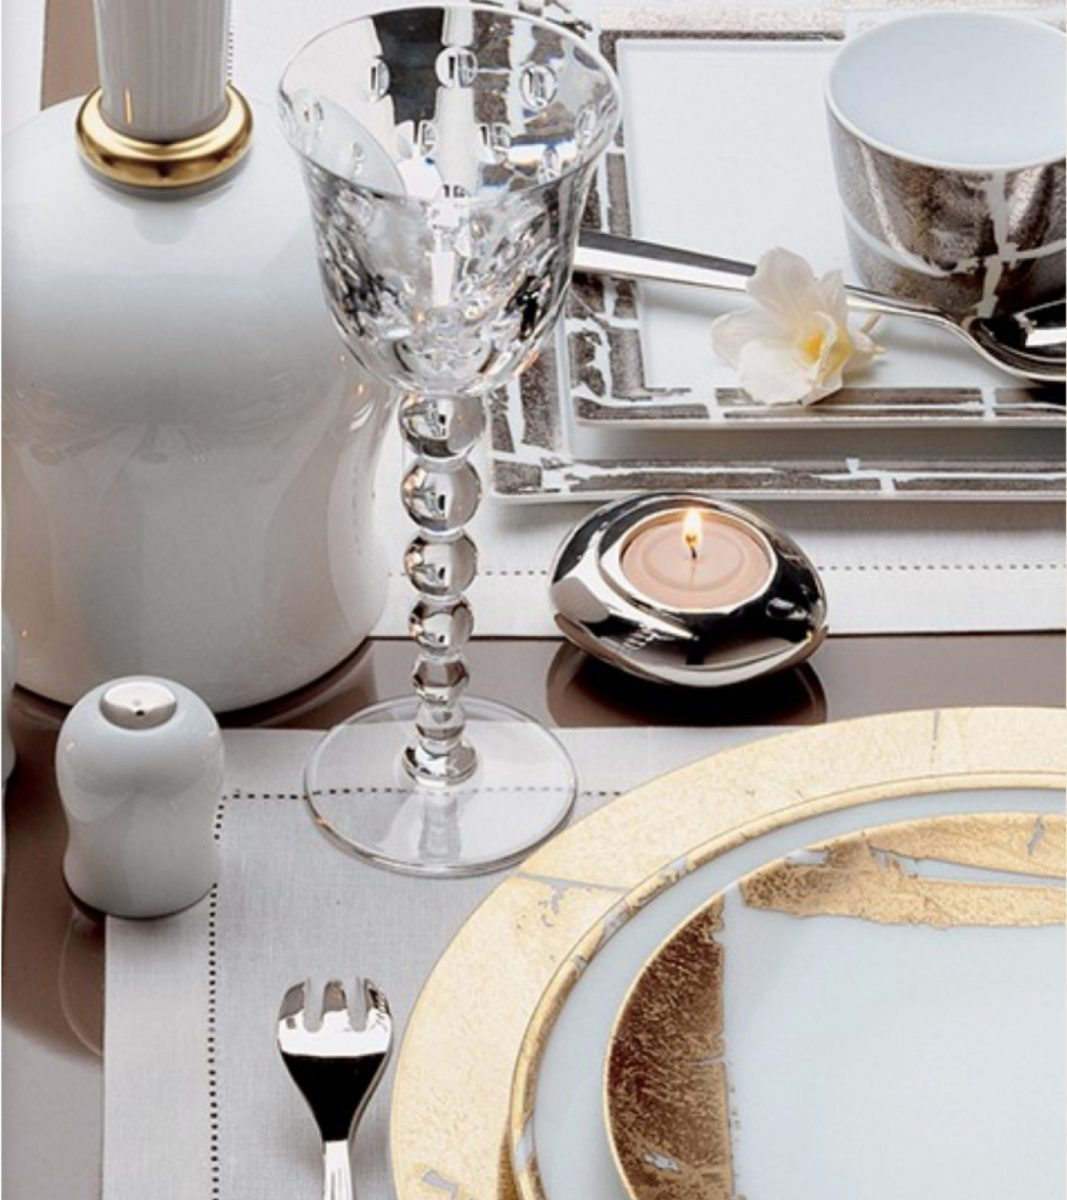 Bernardaud's Feuille d'or design